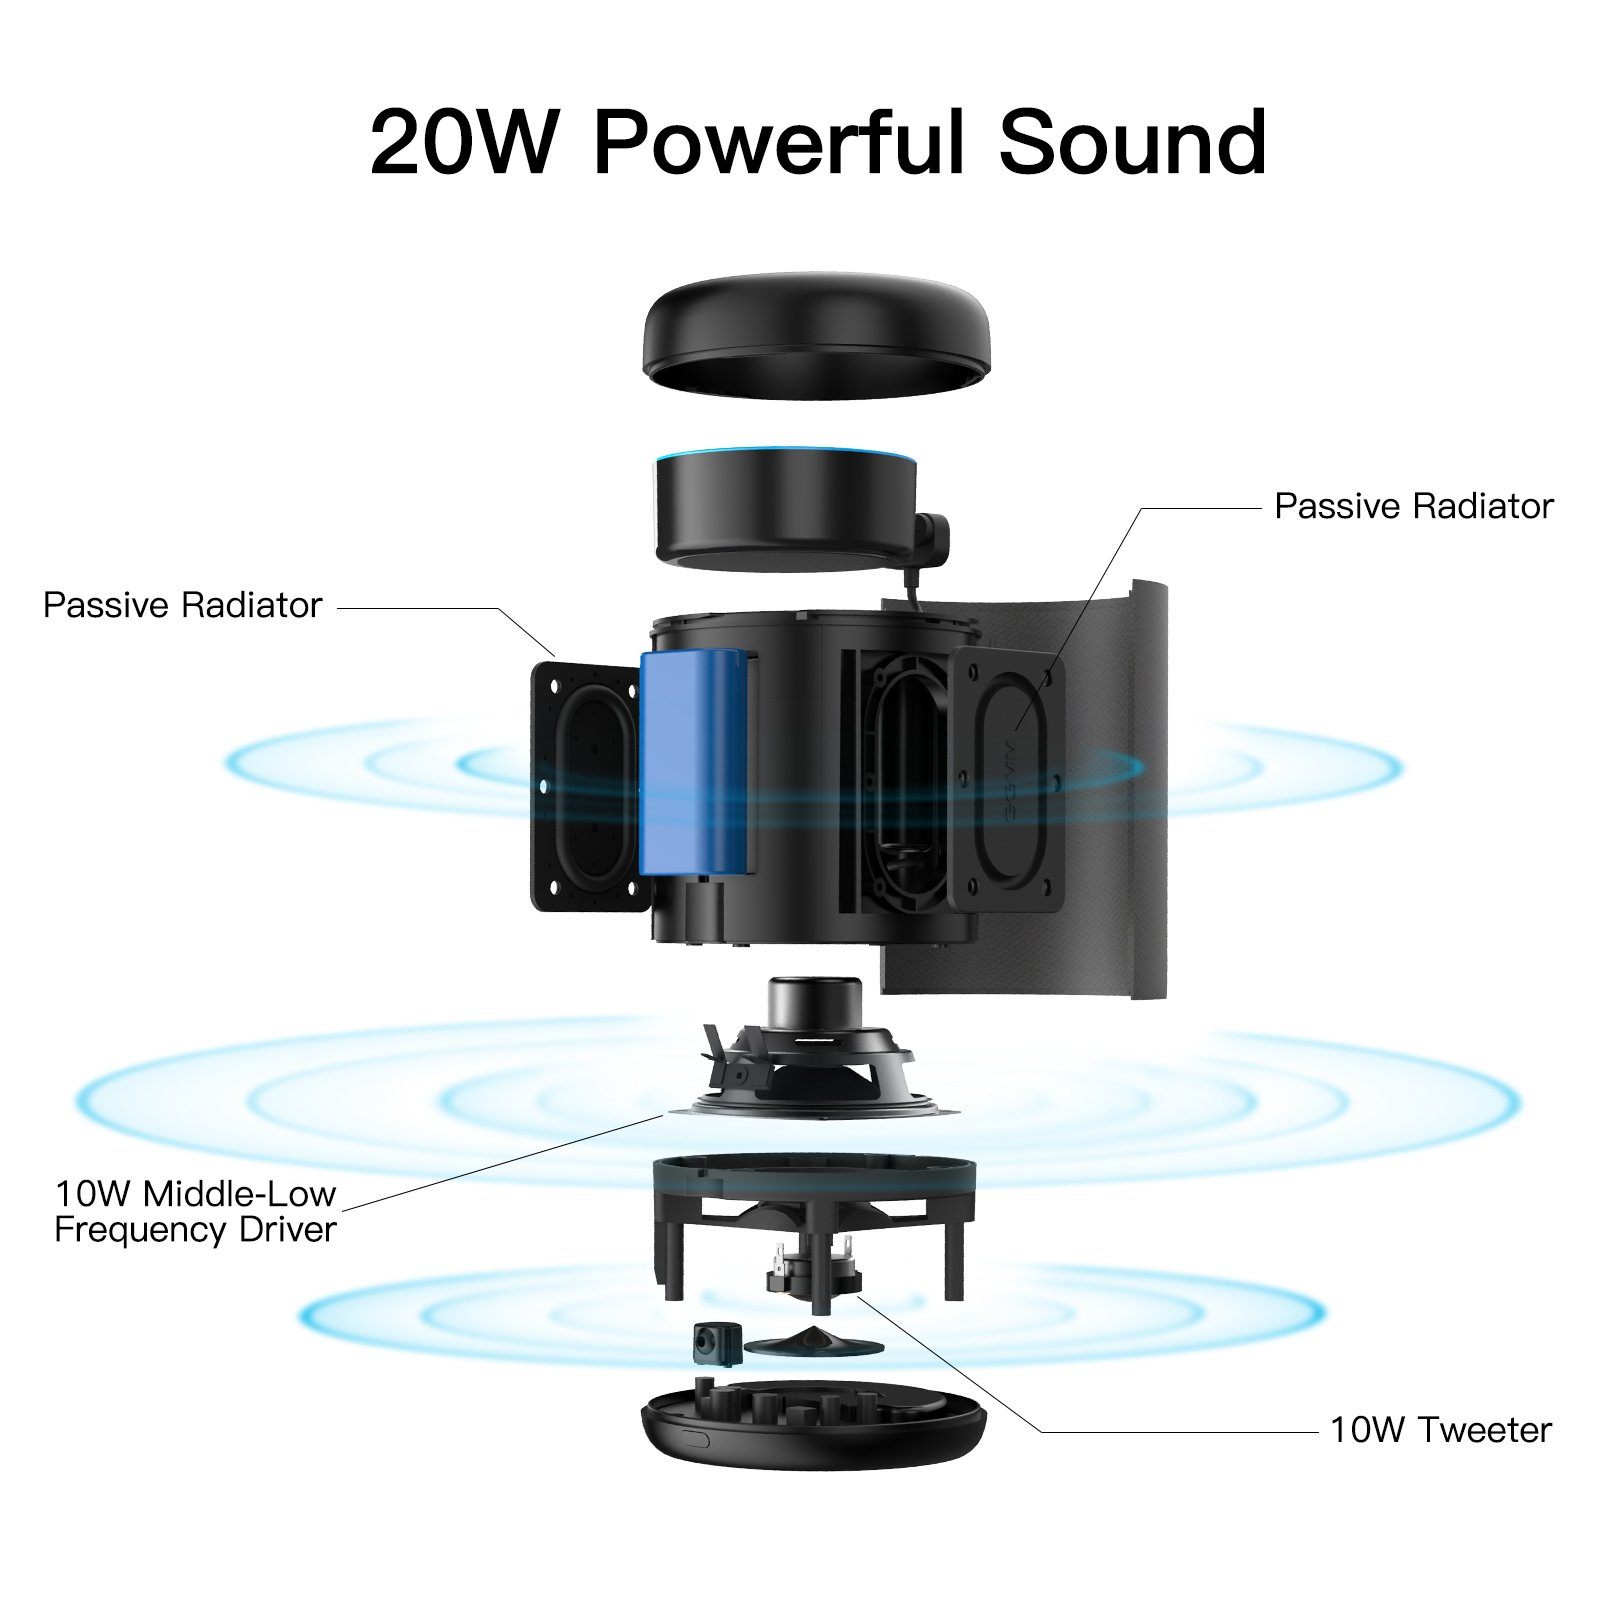 GGMM D6 Portable Speaker for Amazon Echo Dot 2nd Generation, 20W Powerful True 360 Alexa Speakers (DOT SOLD SEPARATELY) by GGMM (Image #2)